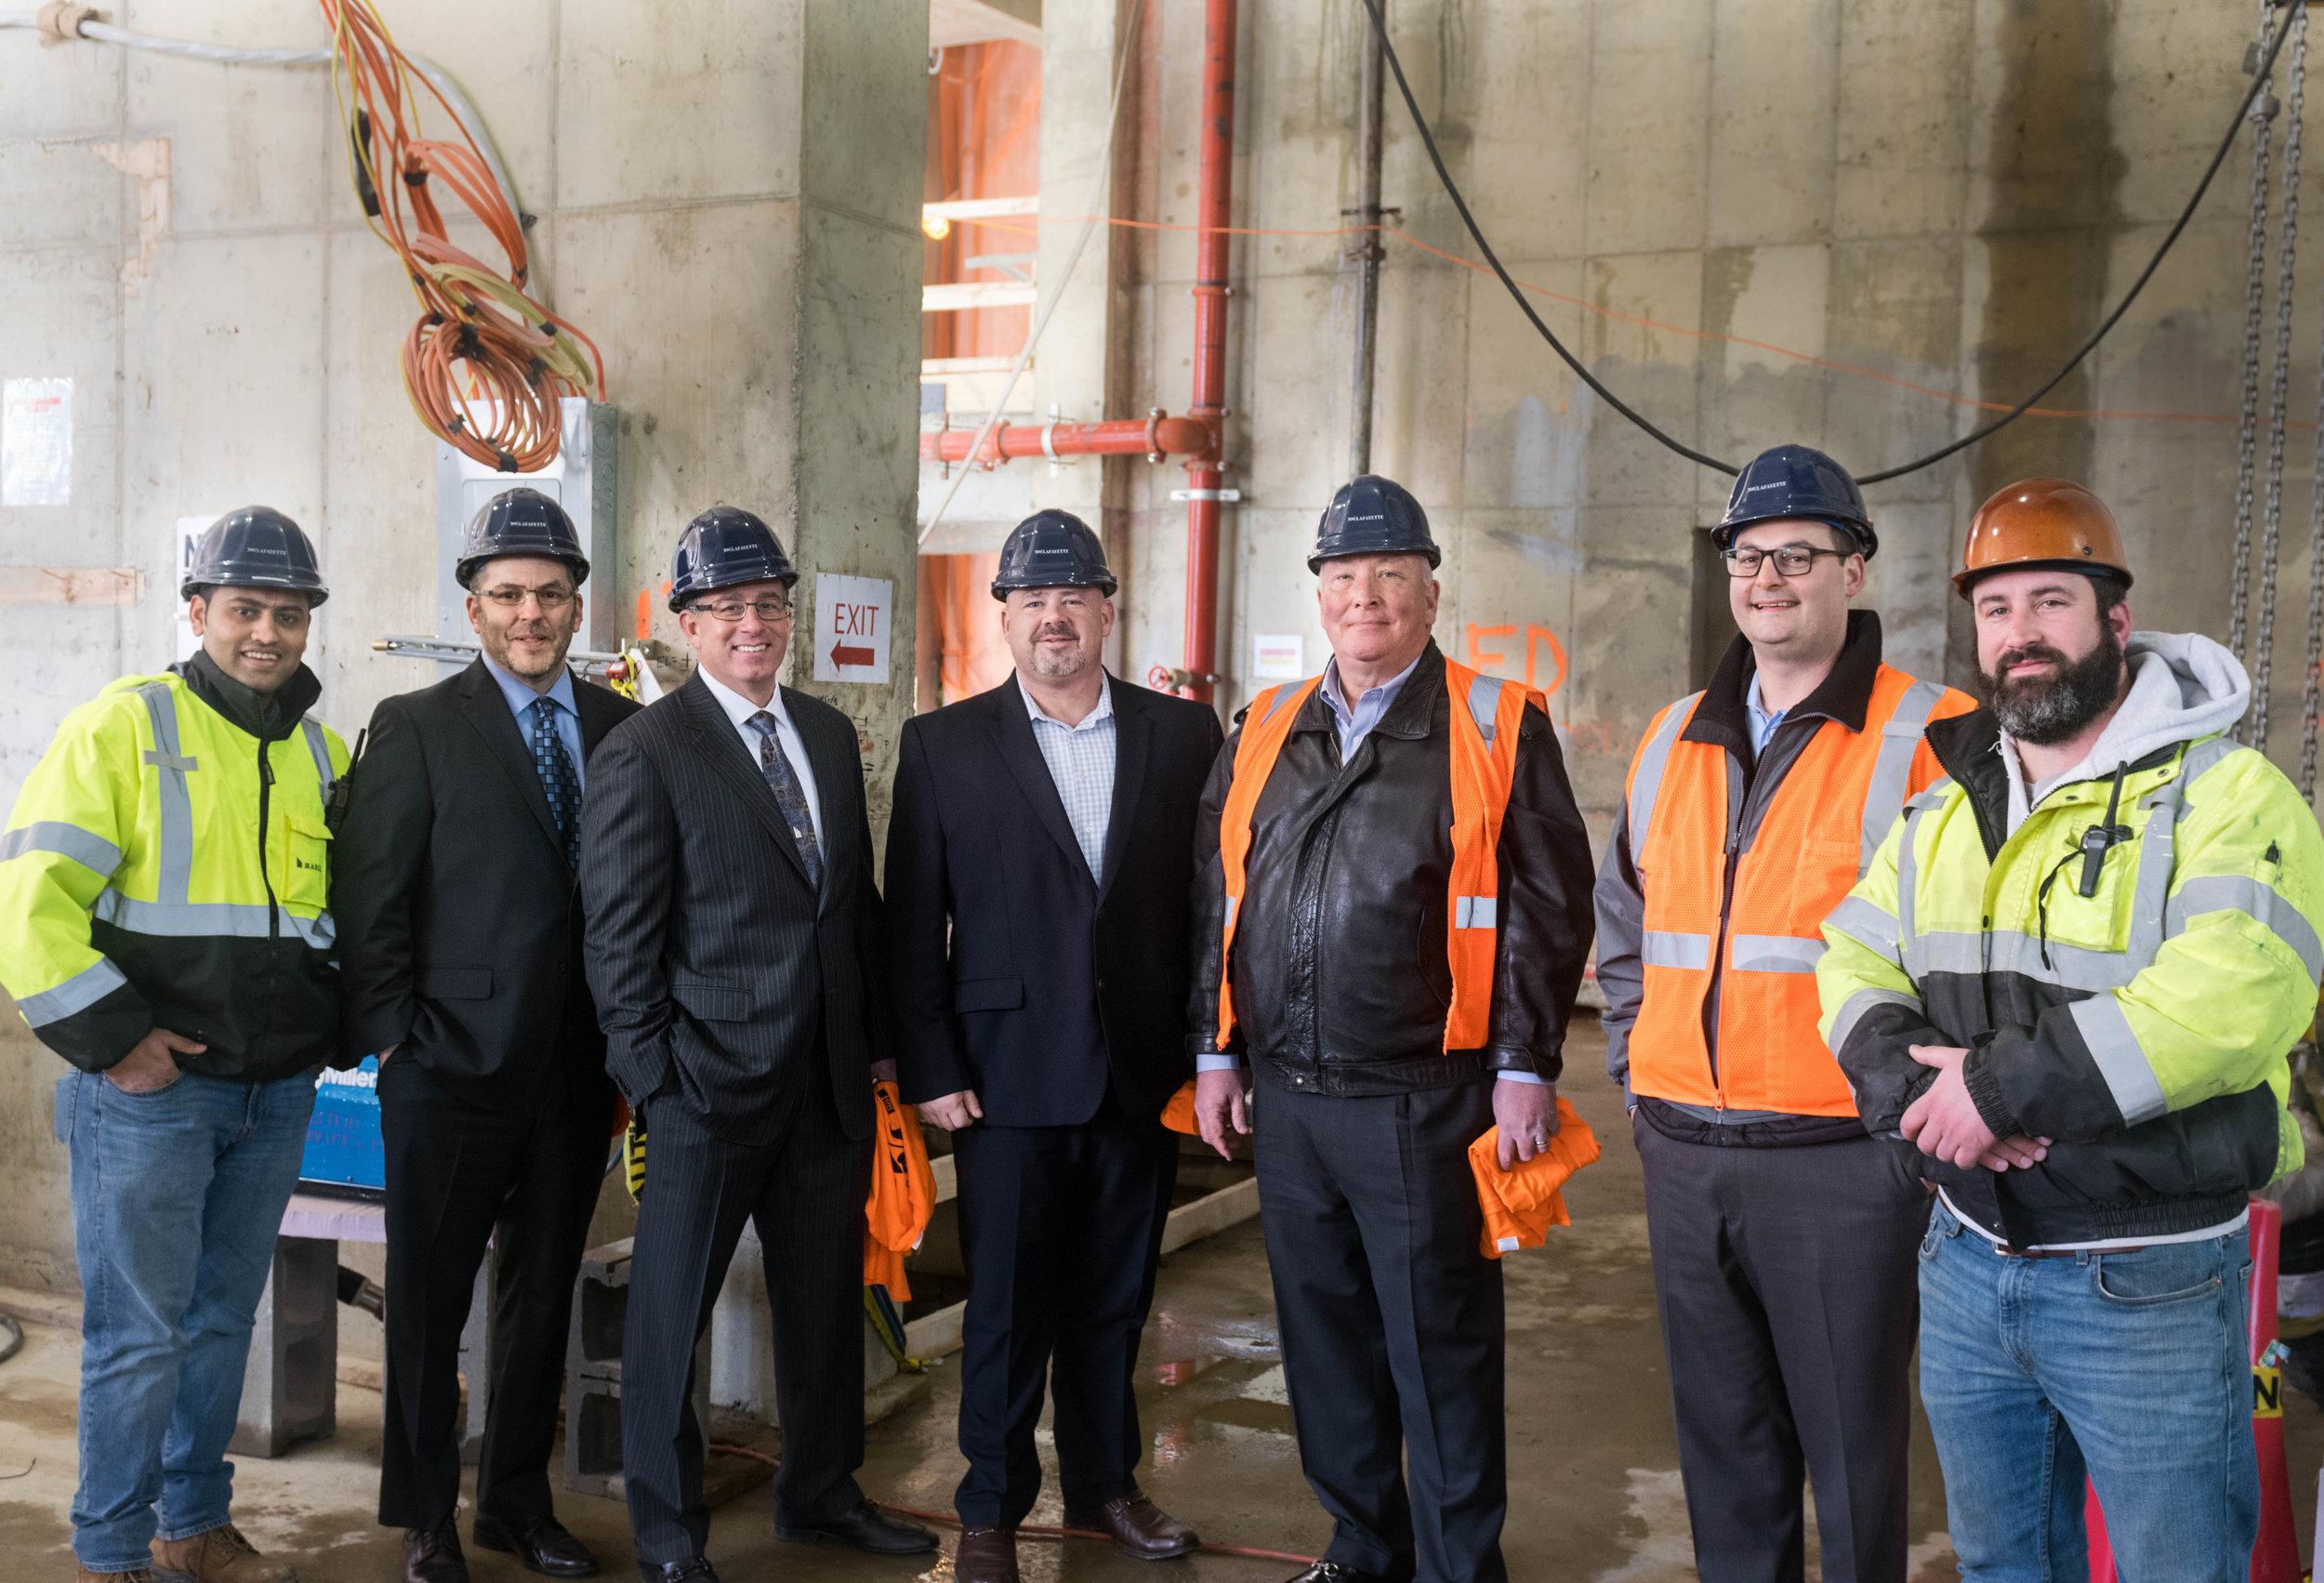 March Construction Upper-Management Team